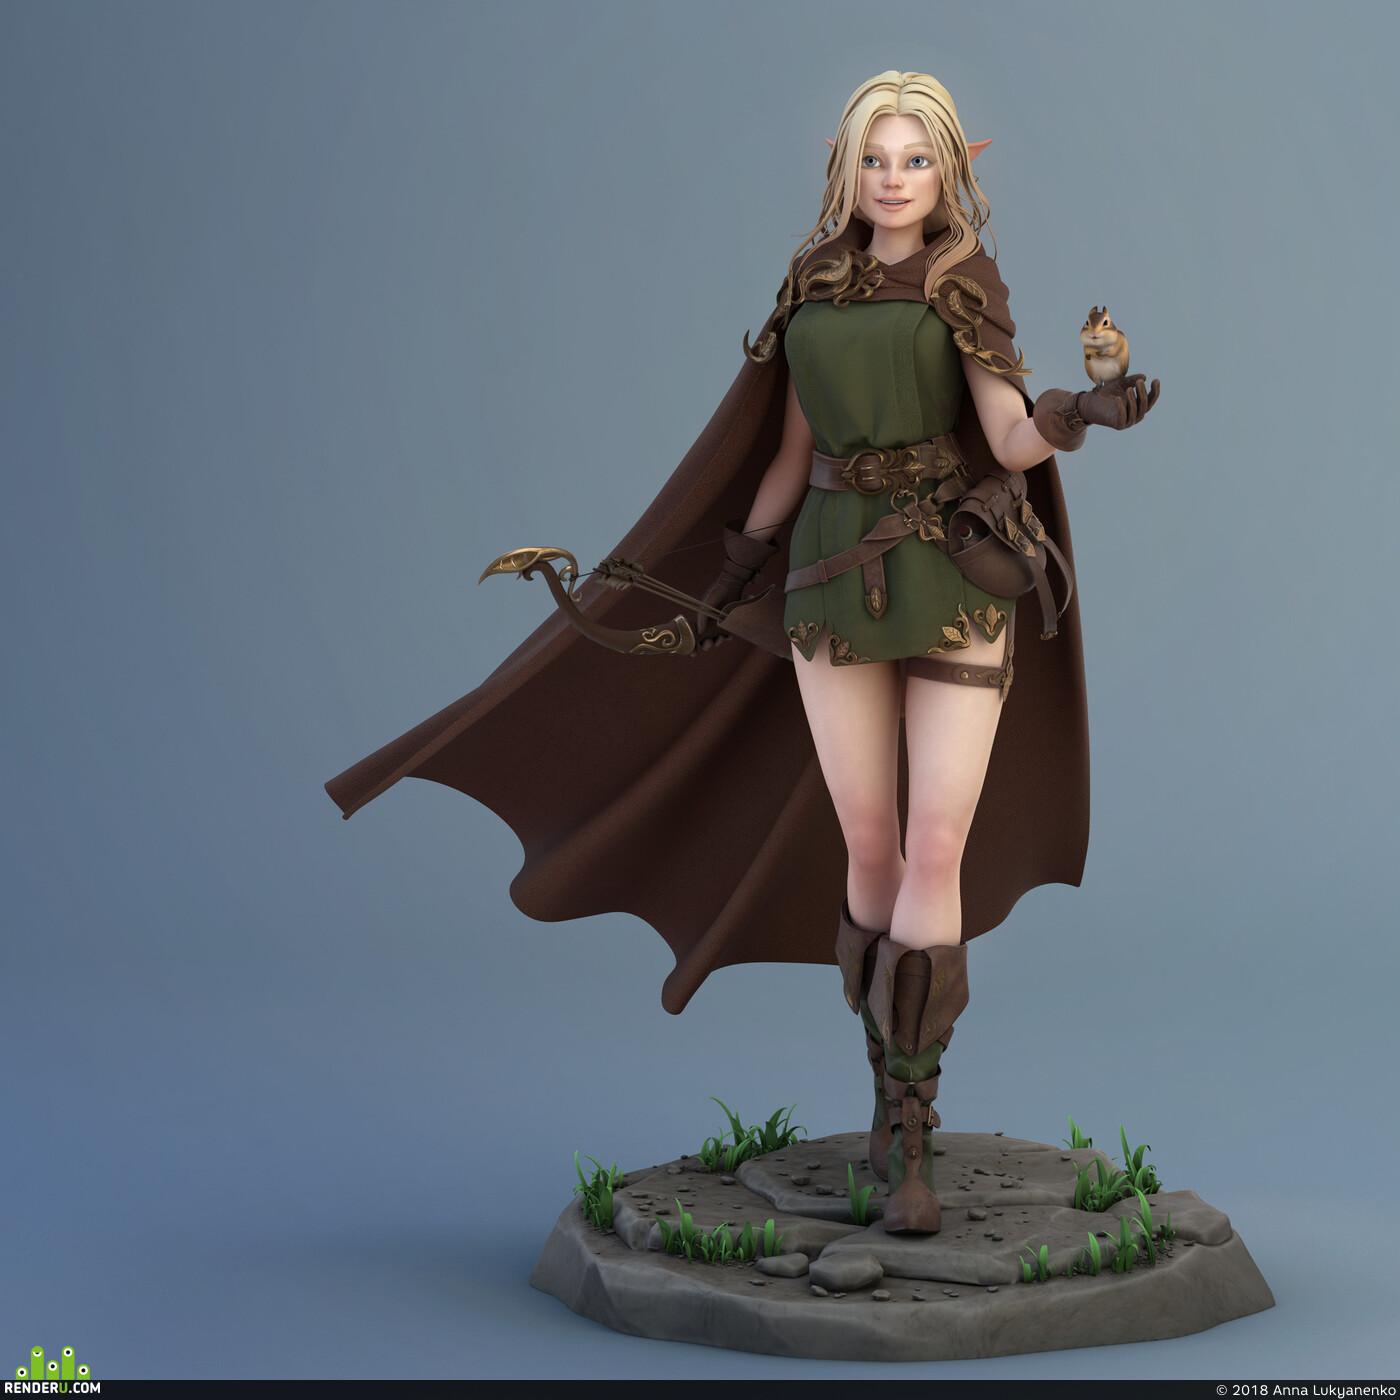 girl, 3dmodel, Characters, fantasy